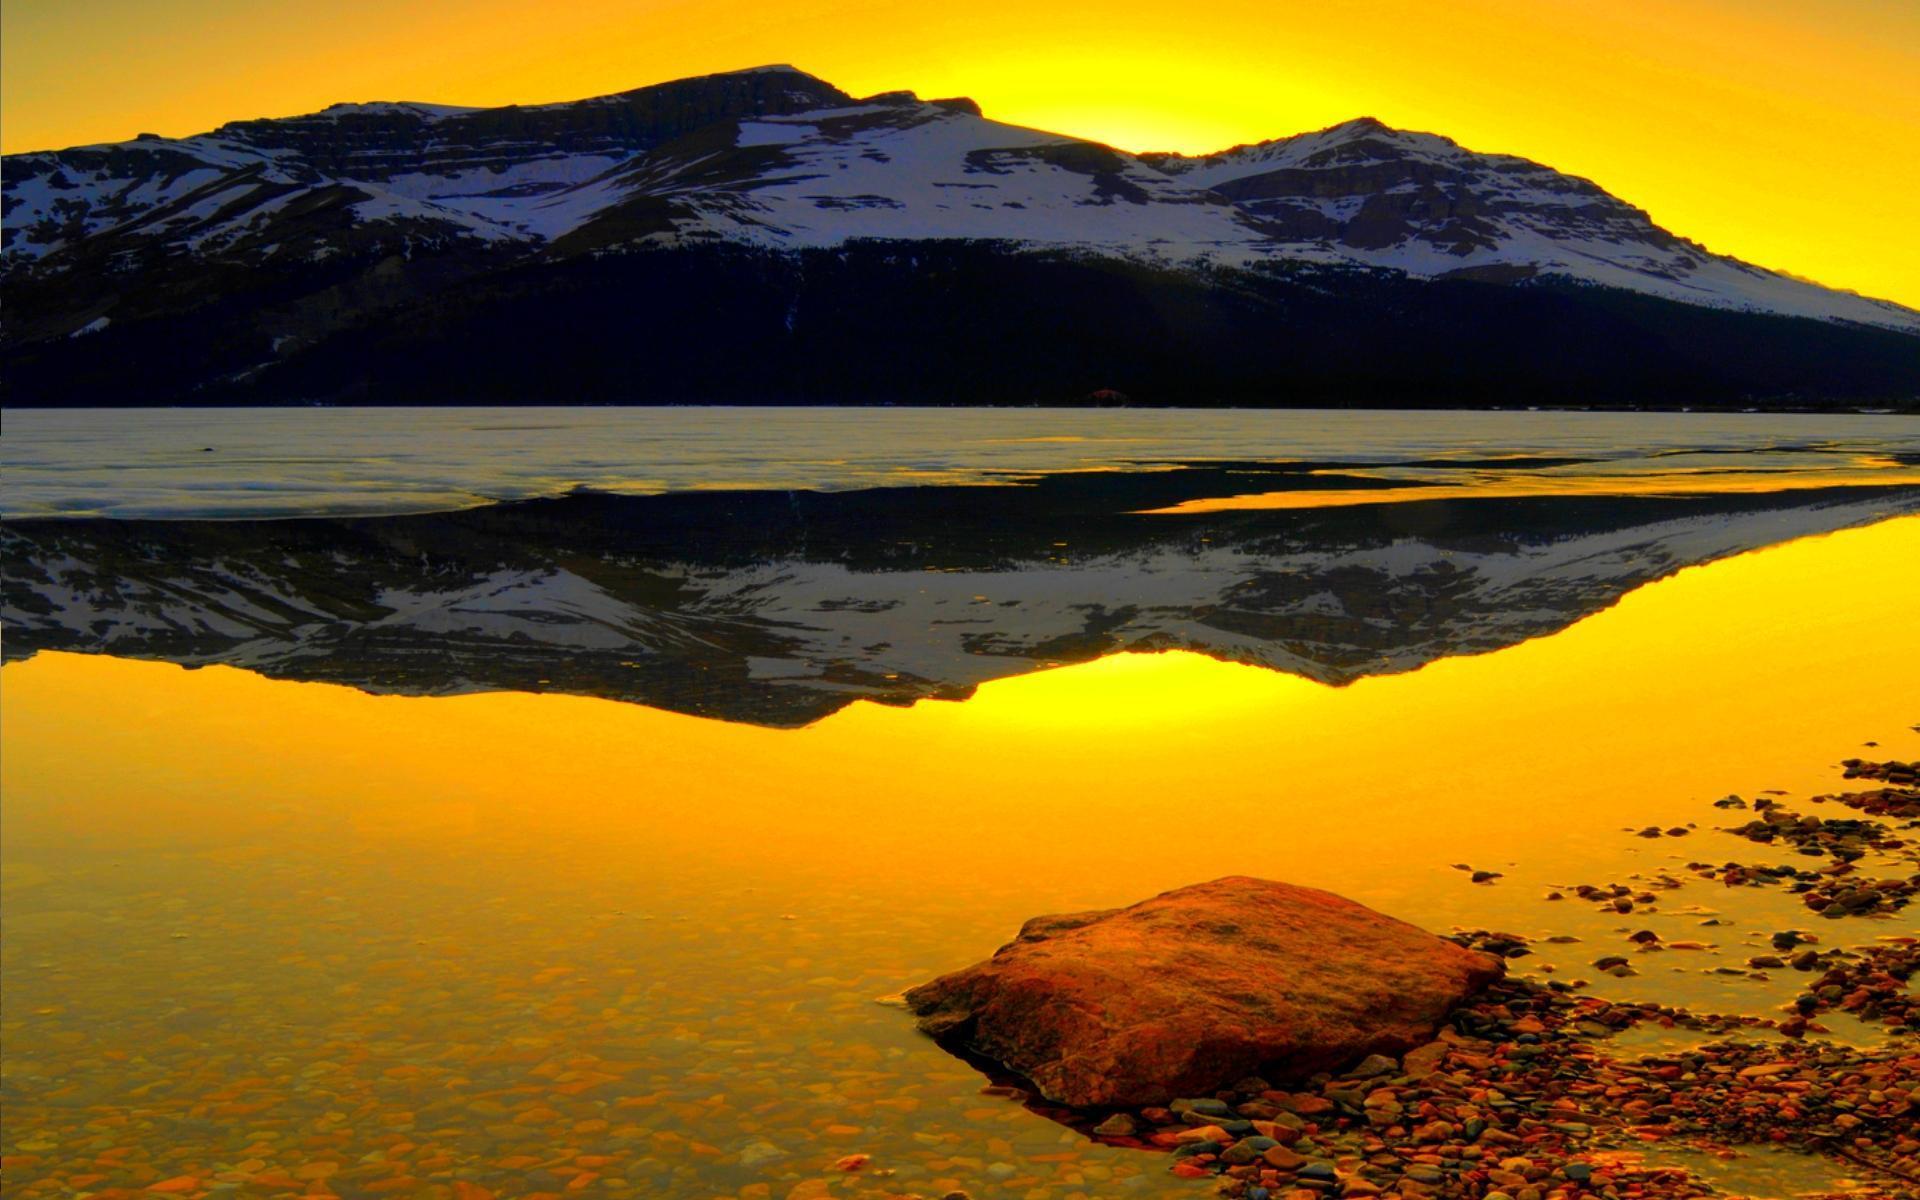 Mountains, lake, sea, sunset, dusk. Mountain Lake At Sunset Hd Desktop Wallpaper Widescreen High Definition Fullscreen